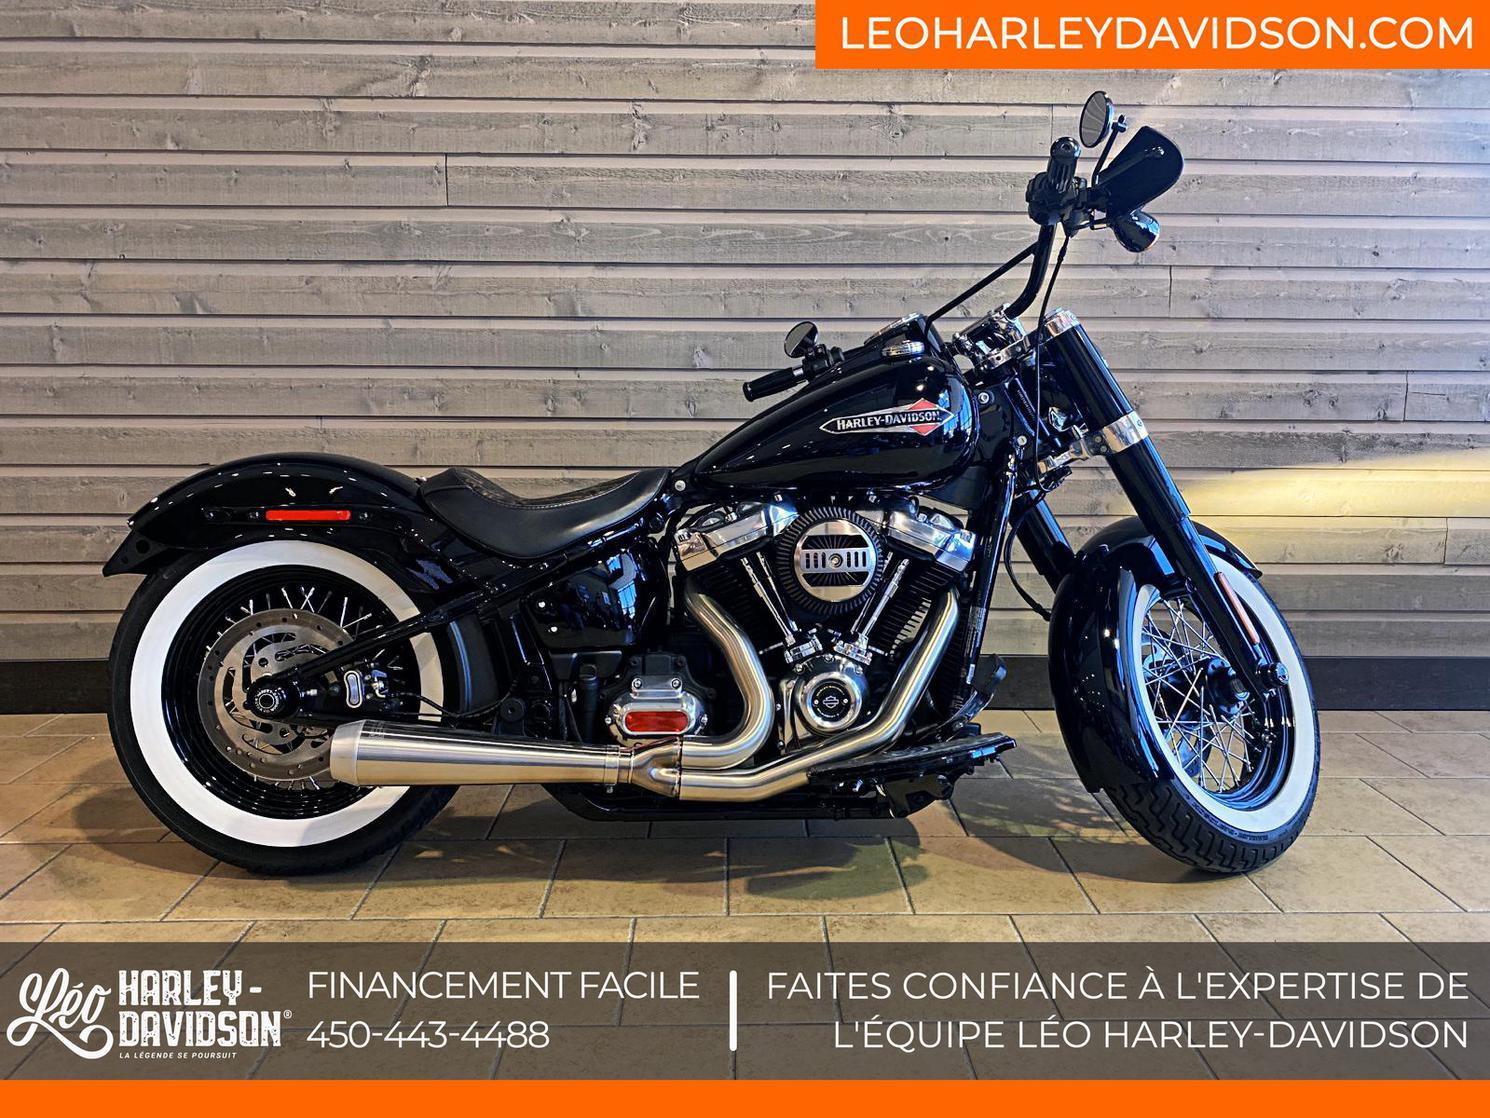 Harley-Davidson ST-Softail Slim 2019 - FLSL